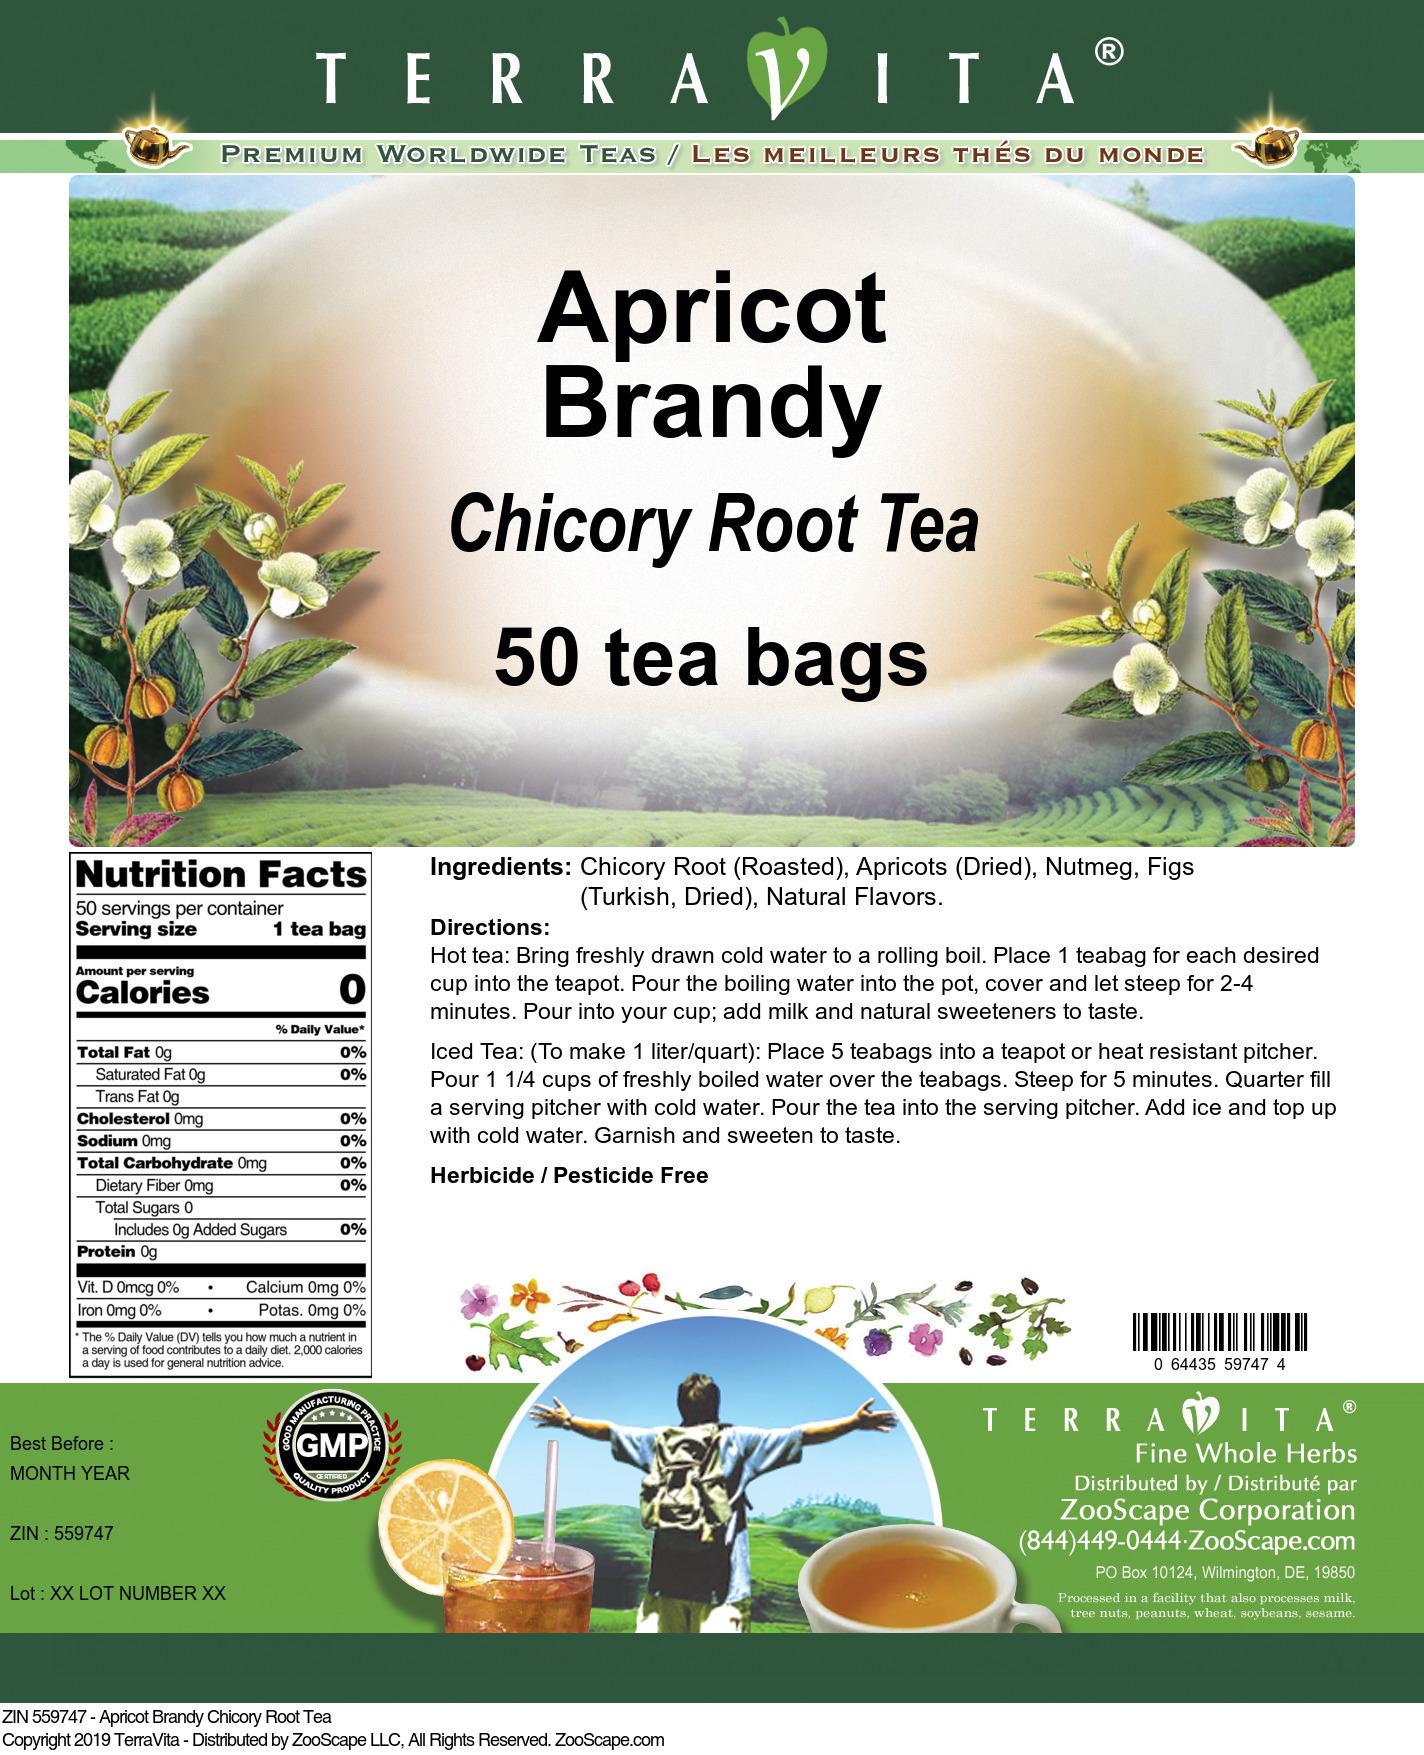 Apricot Brandy Chicory Root Tea